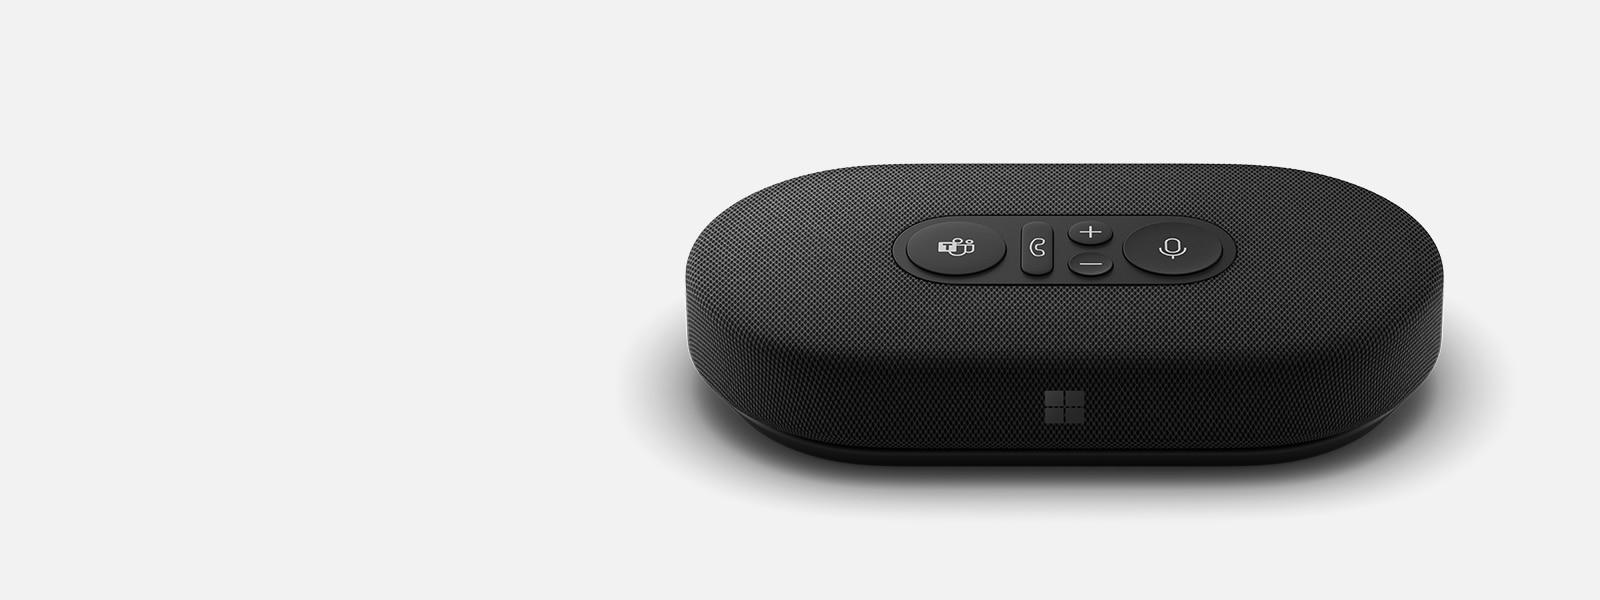 A Microsoft Modern USB-C Speaker